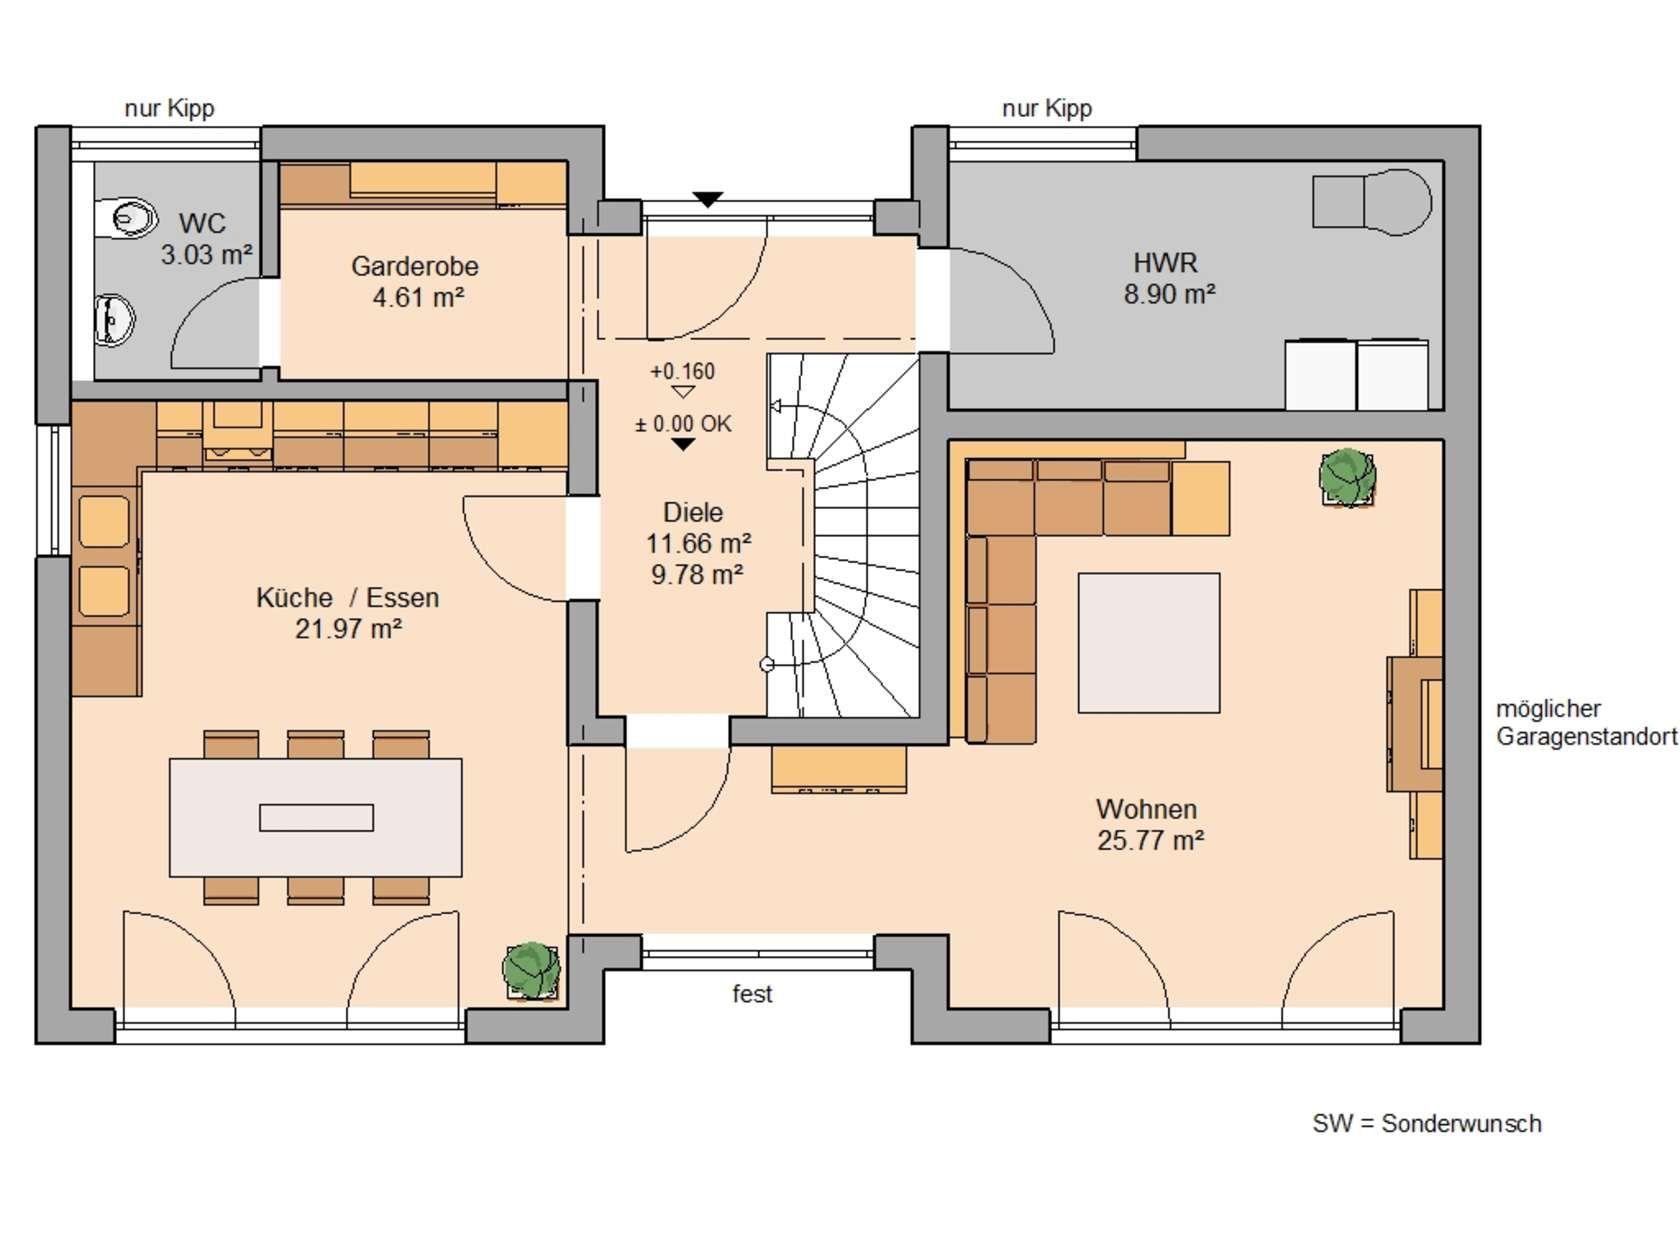 Familienhäuser Kern haus, Haus und Familienhaus